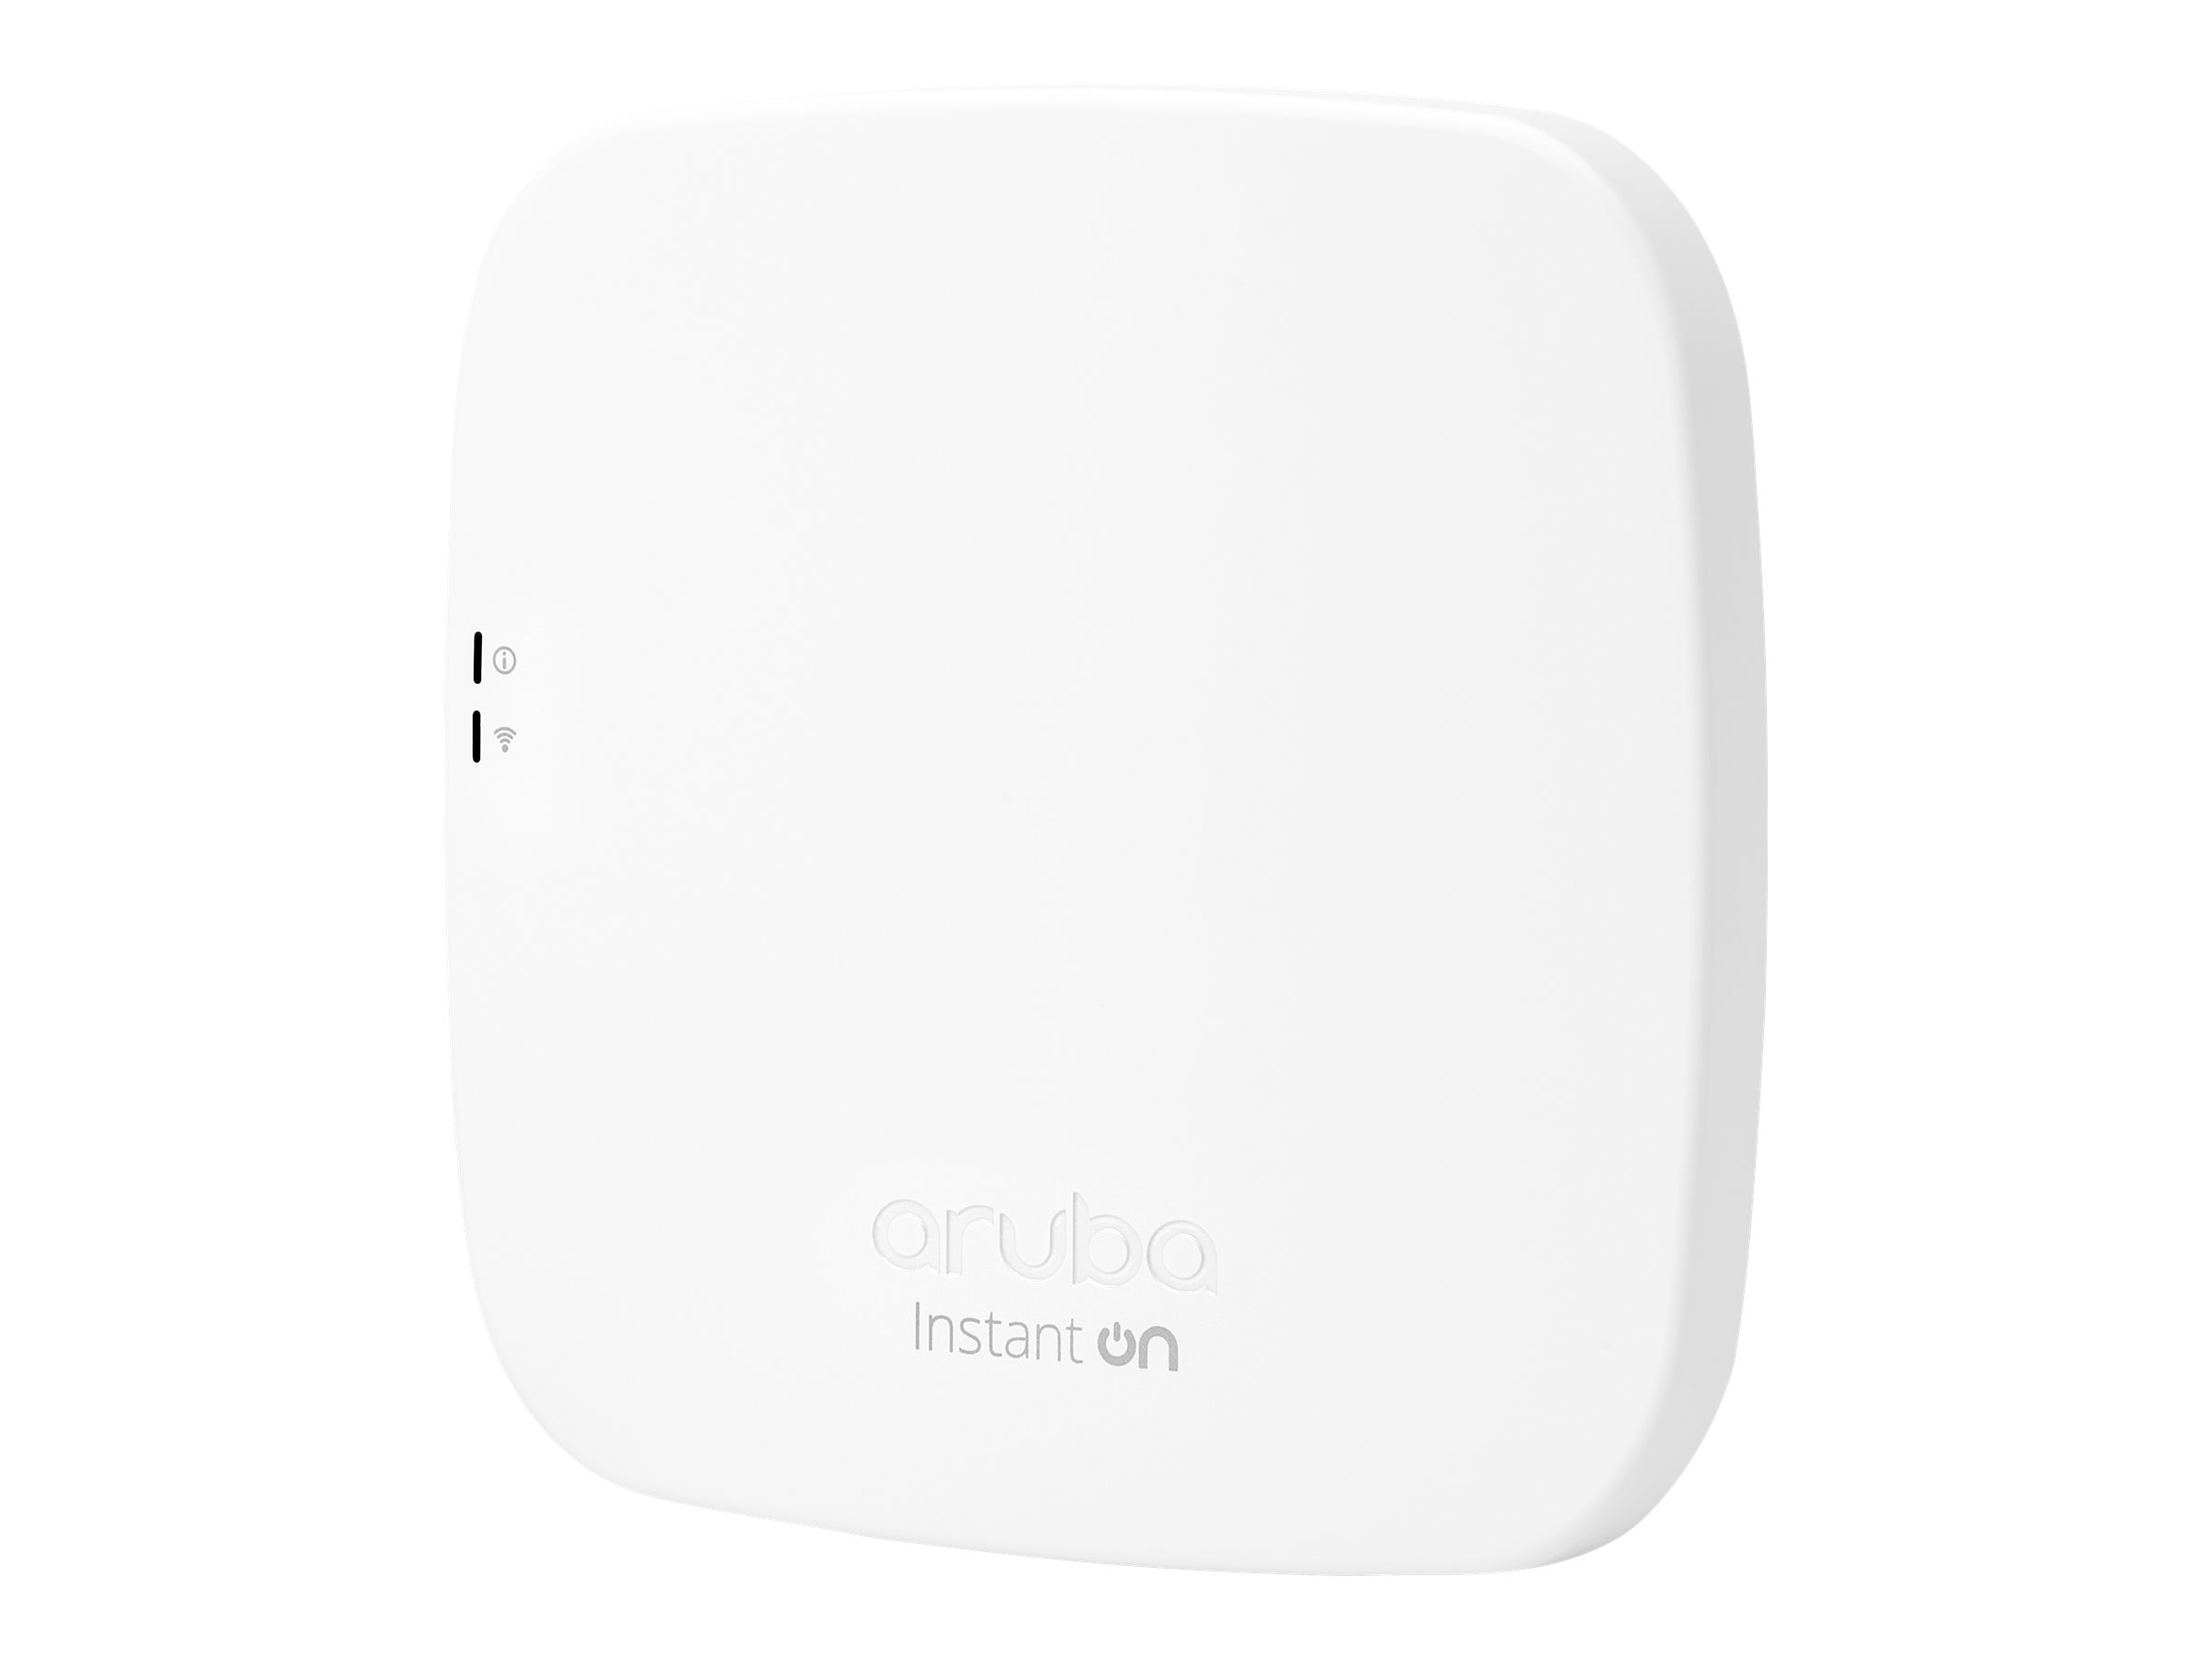 Hpe aruba instant on ap12 rw funkbasisstation 802 11ac wave 2 bluetooth wi fi dualband 11668517 r3j24a